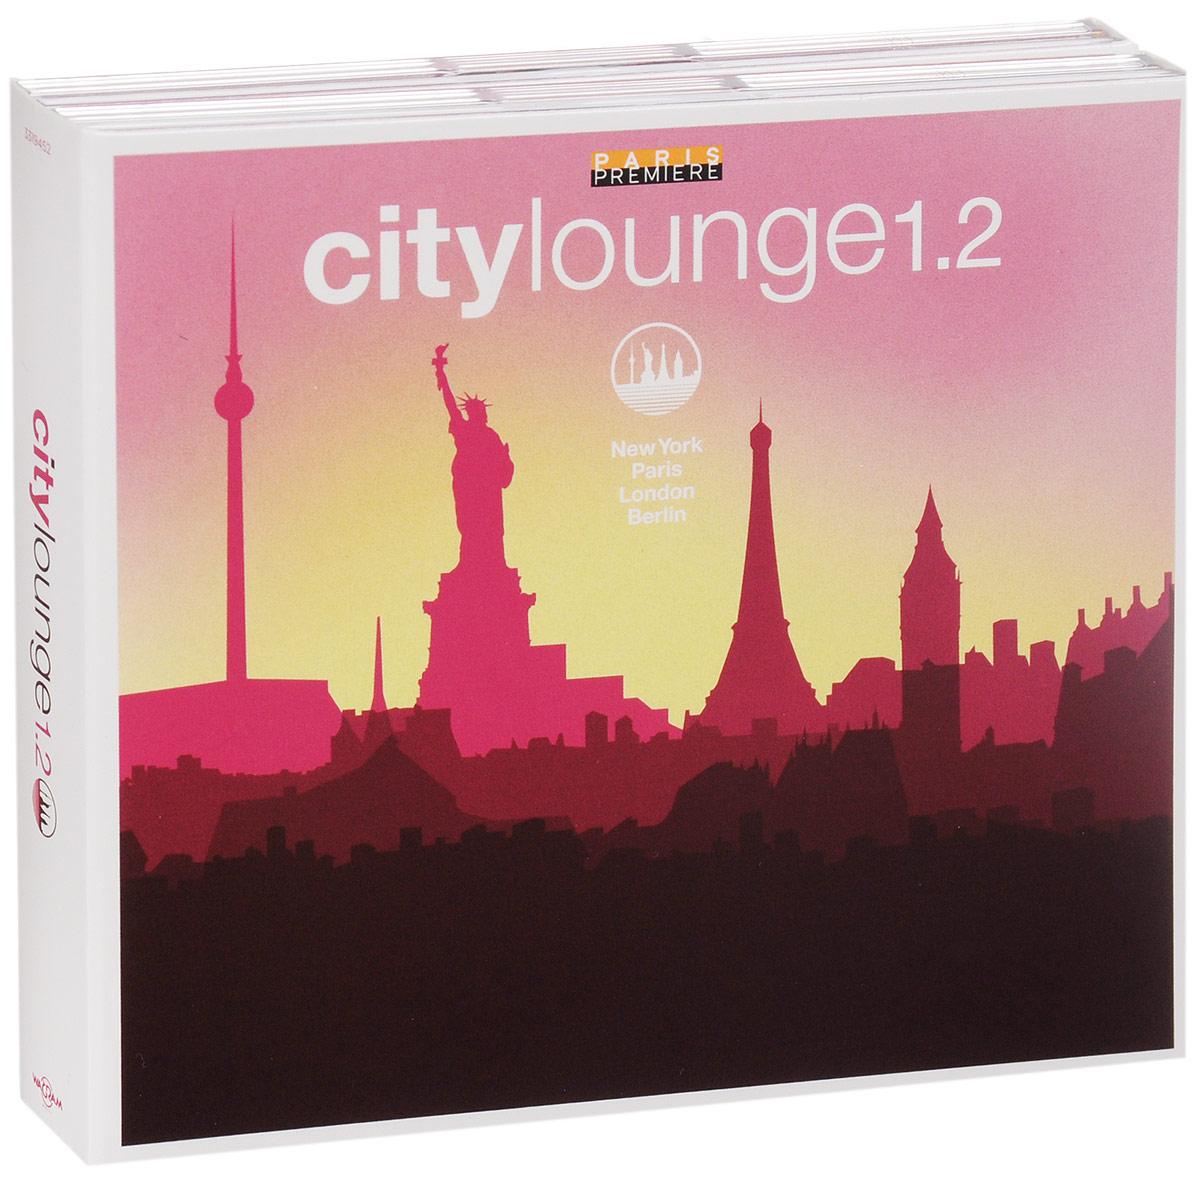 City Lounge 1.2 (4 CD)